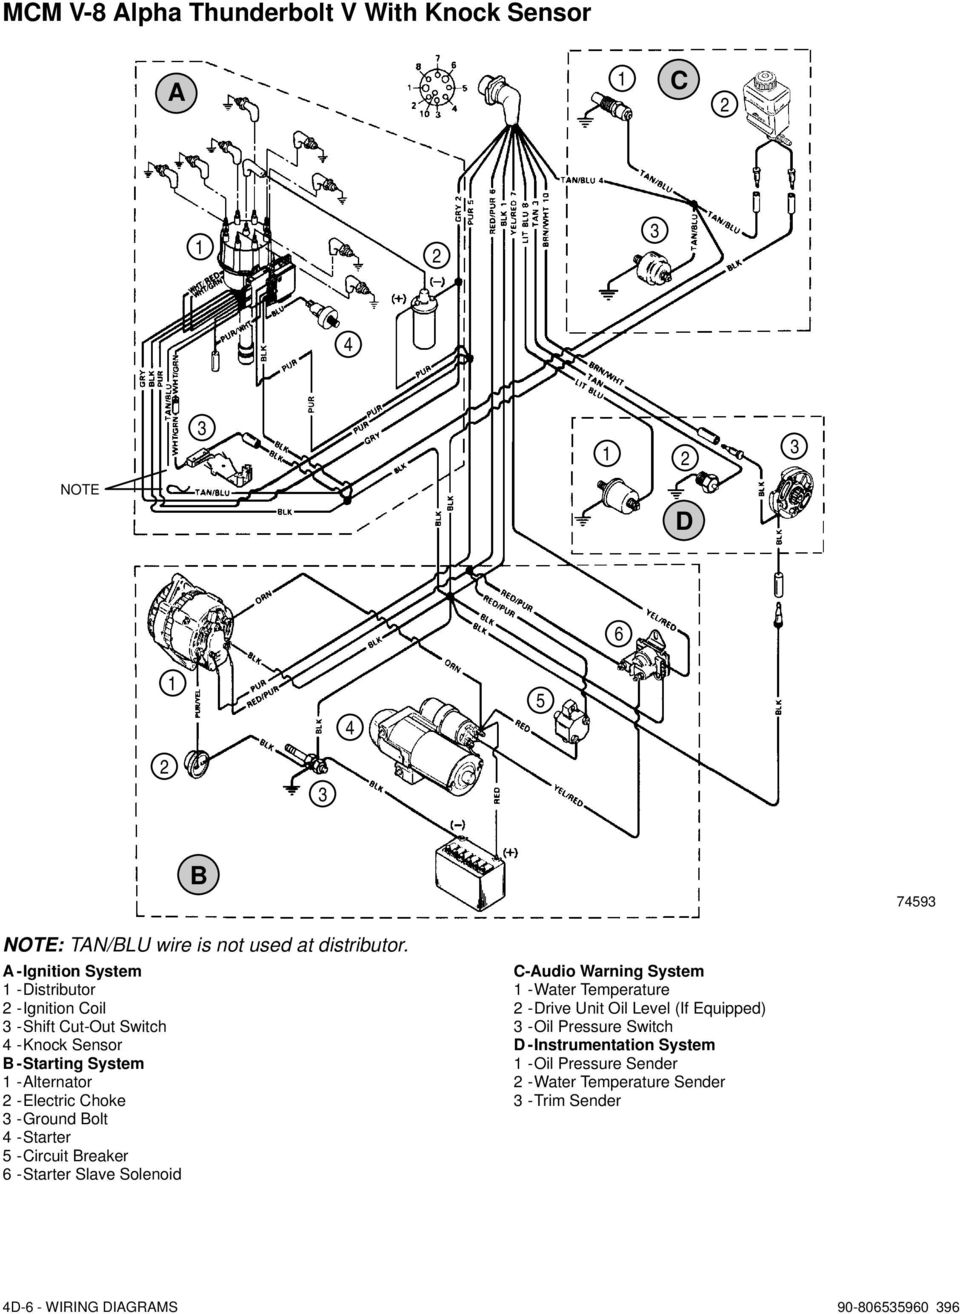 medium resolution of electrical systems wiring diagrams pdf rh docplayer net 5 0 mercruiser engine wiring diagram 5 0 mercruiser engine wiring diagram